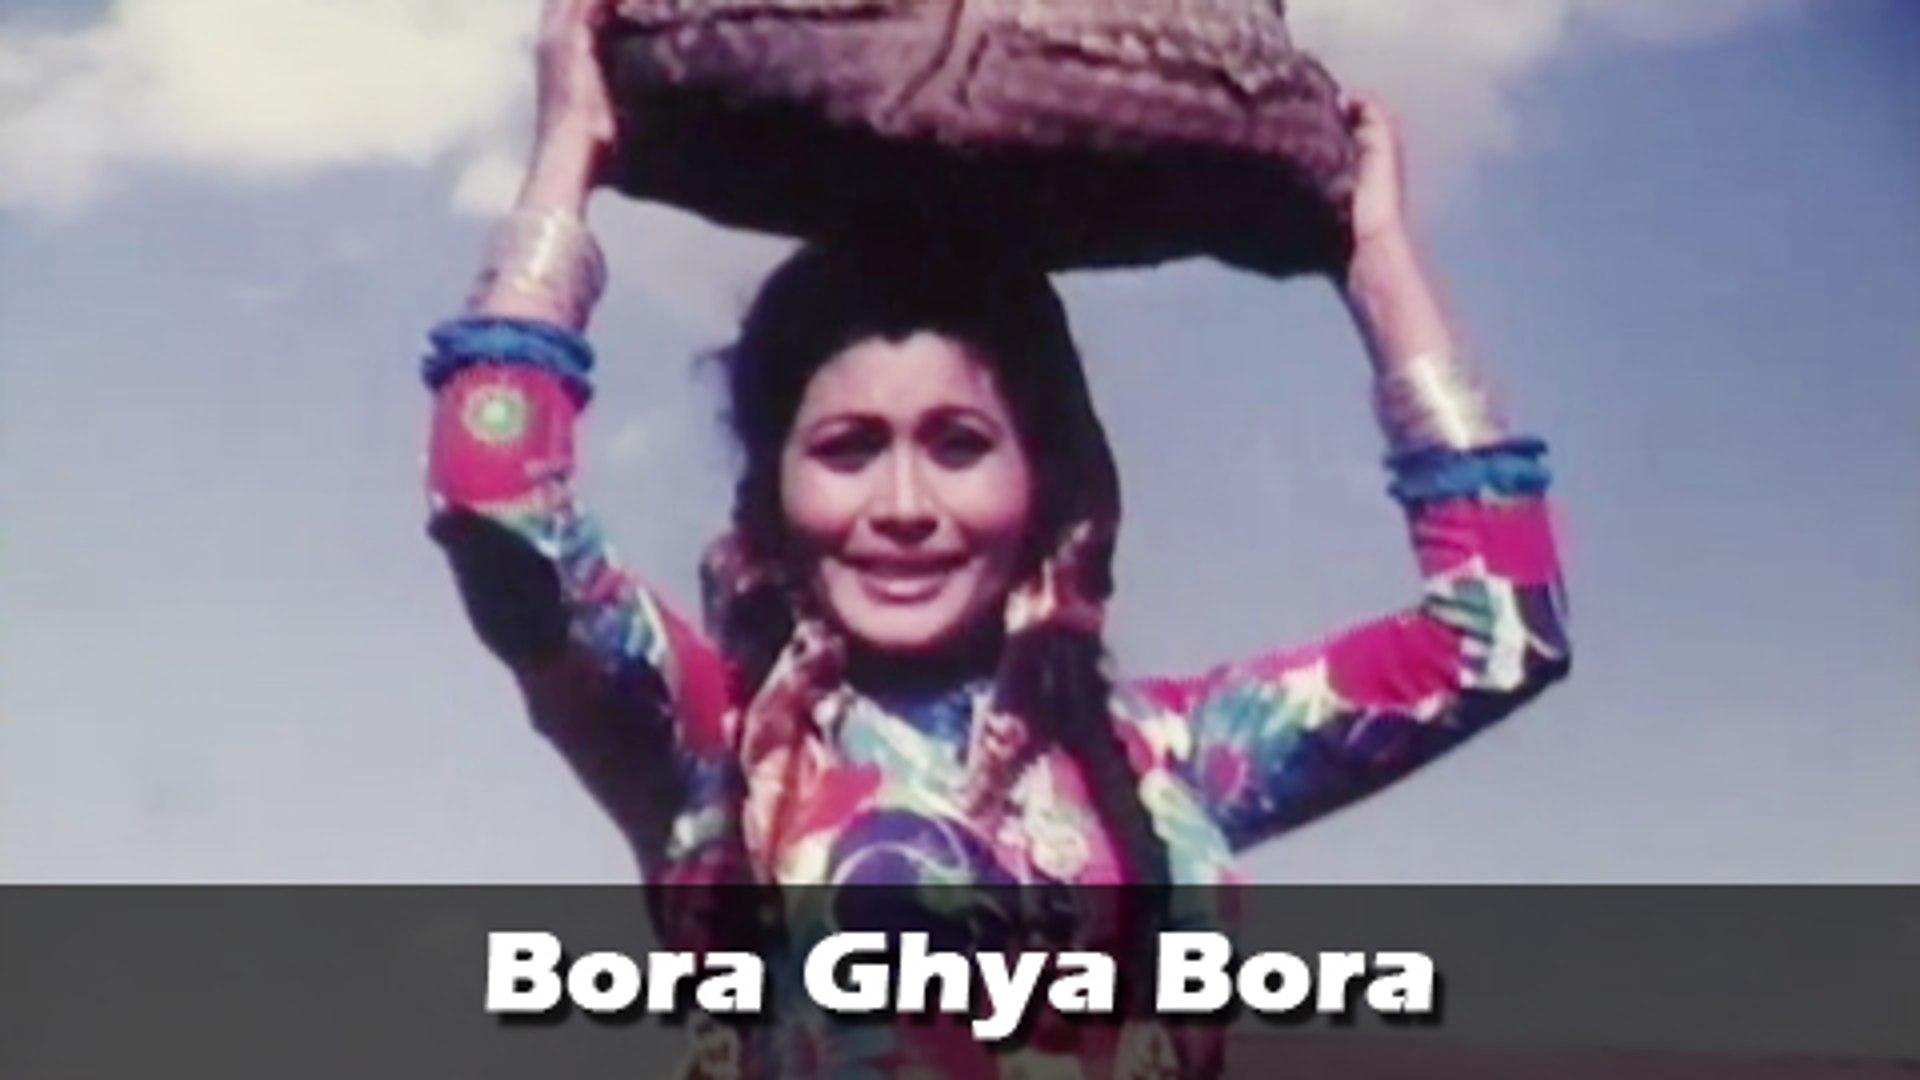 Bora Ghya Bora! - Ram Kadam Classic Marathi Song - Usha Naik - Totaya Aamdar Marathi Movie